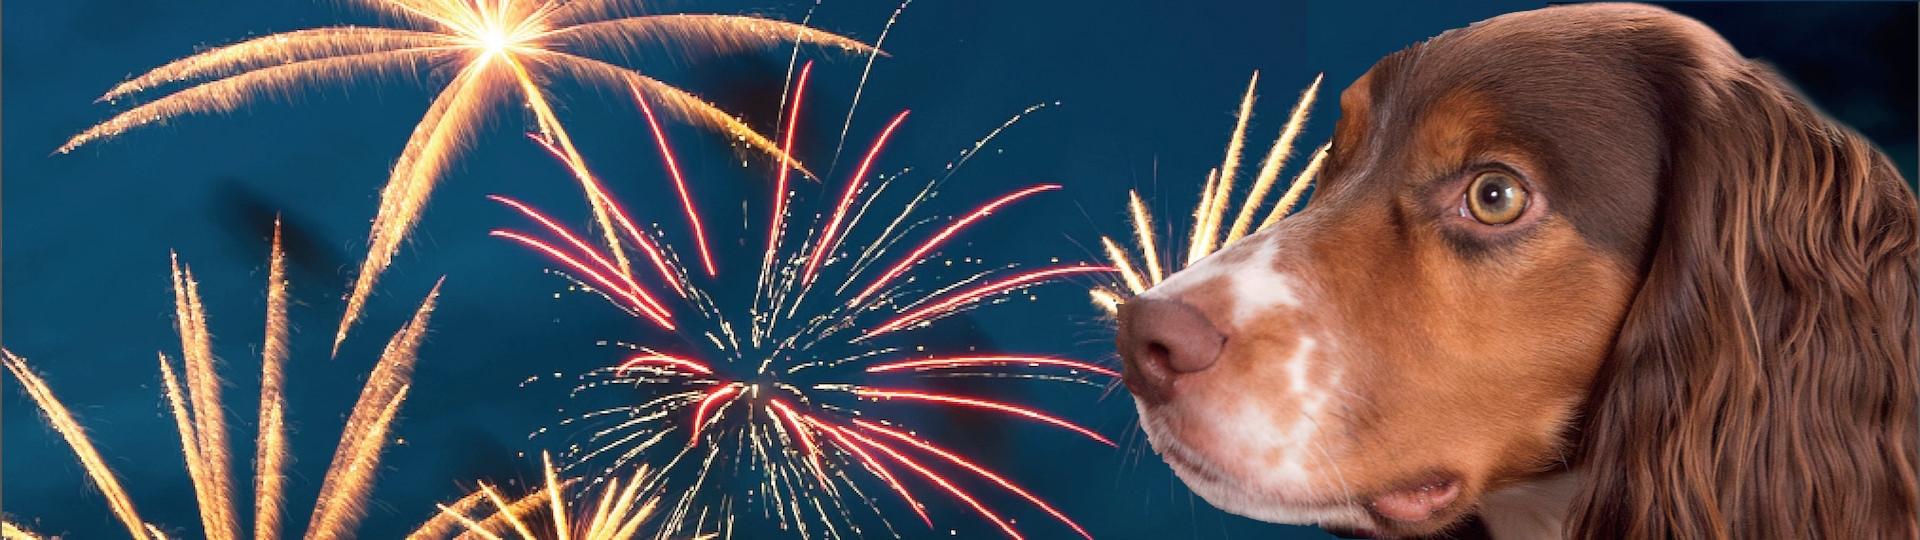 Fear of Fireworks in Dogs